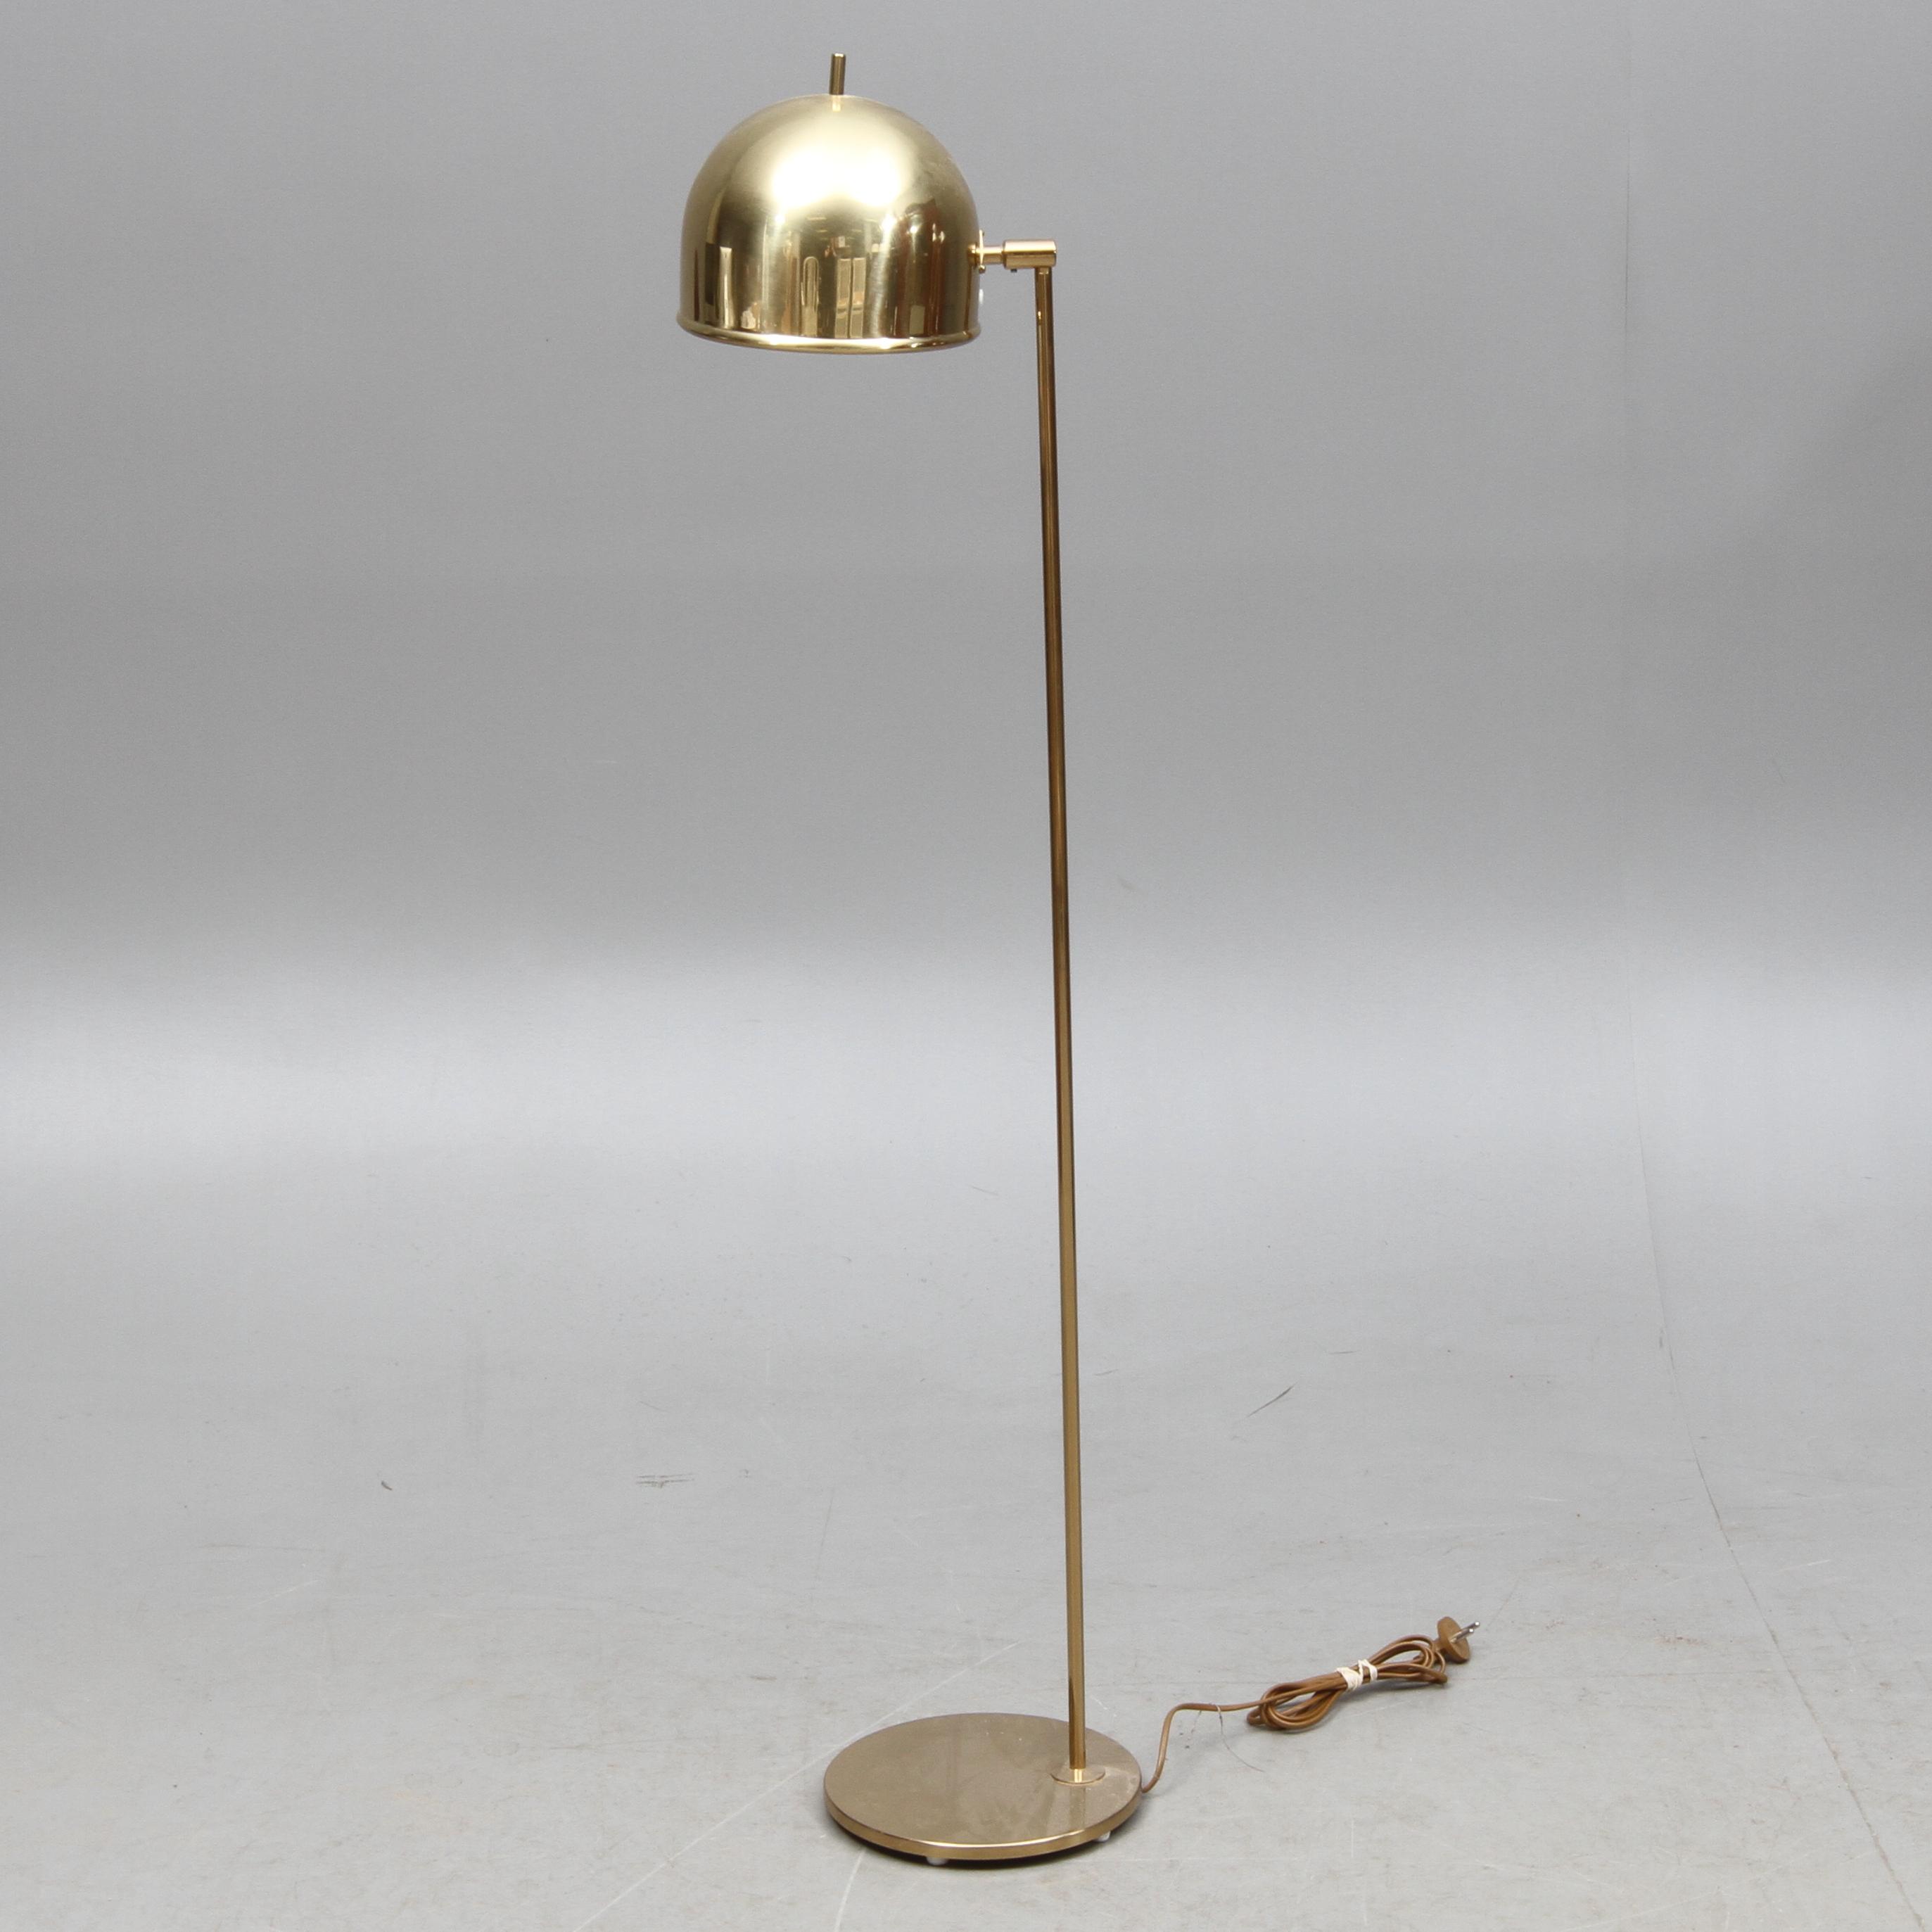 Retro Golvlampa Lampajtp Design Trearmad Golvlampa 2 Fina Rosa U0026 Vit Lampskrmar Till